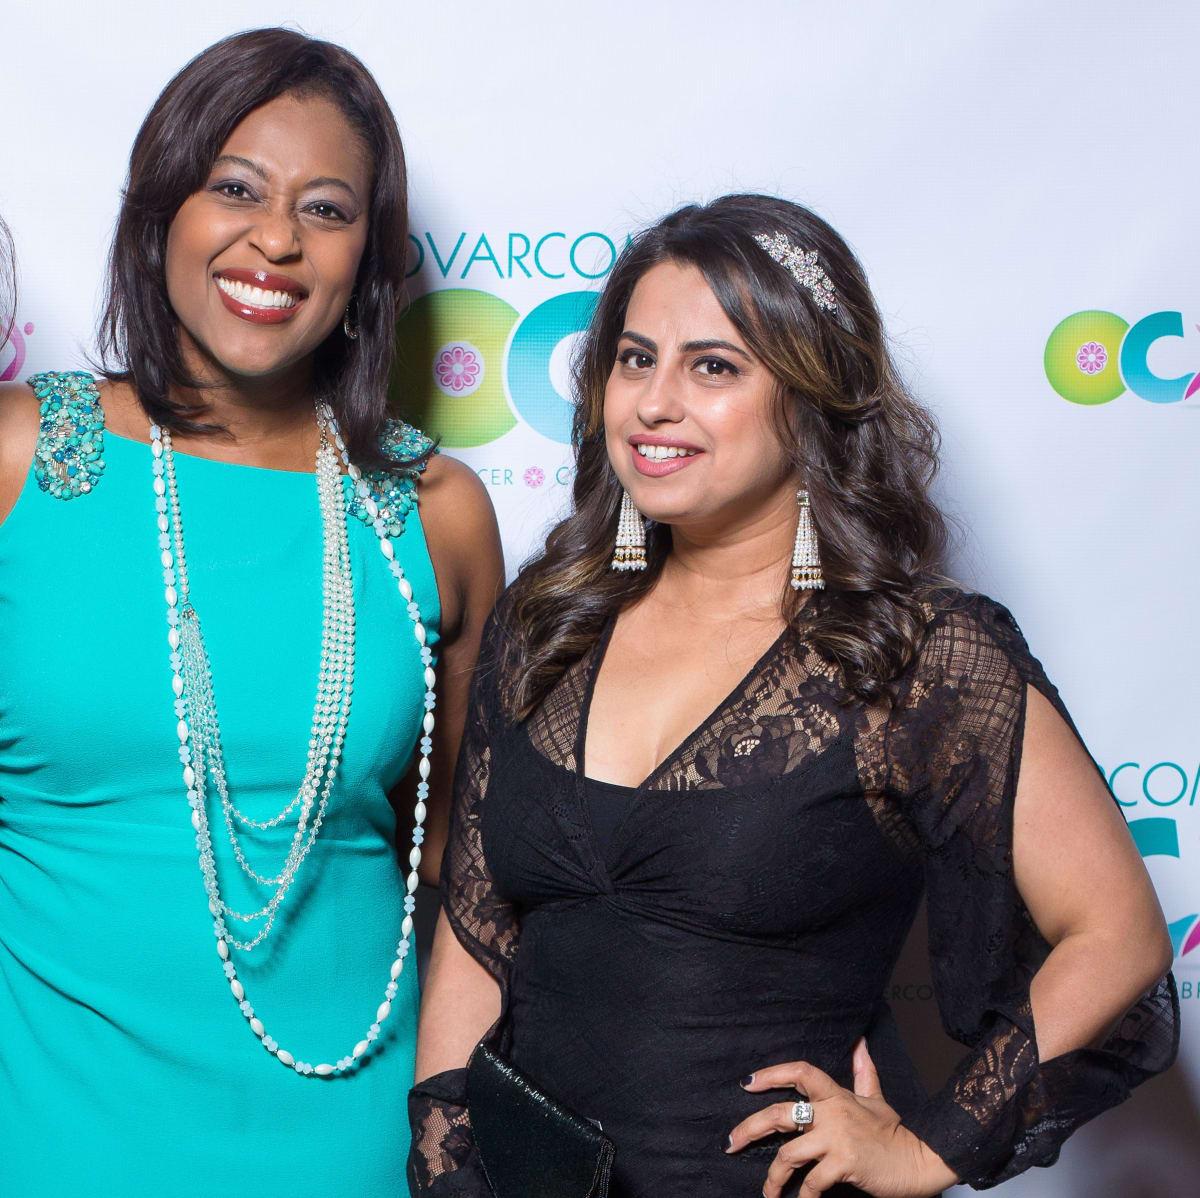 Houston, Ovarcome Gala, May 2016, Sharron Melton, Ruchi Mukherjee